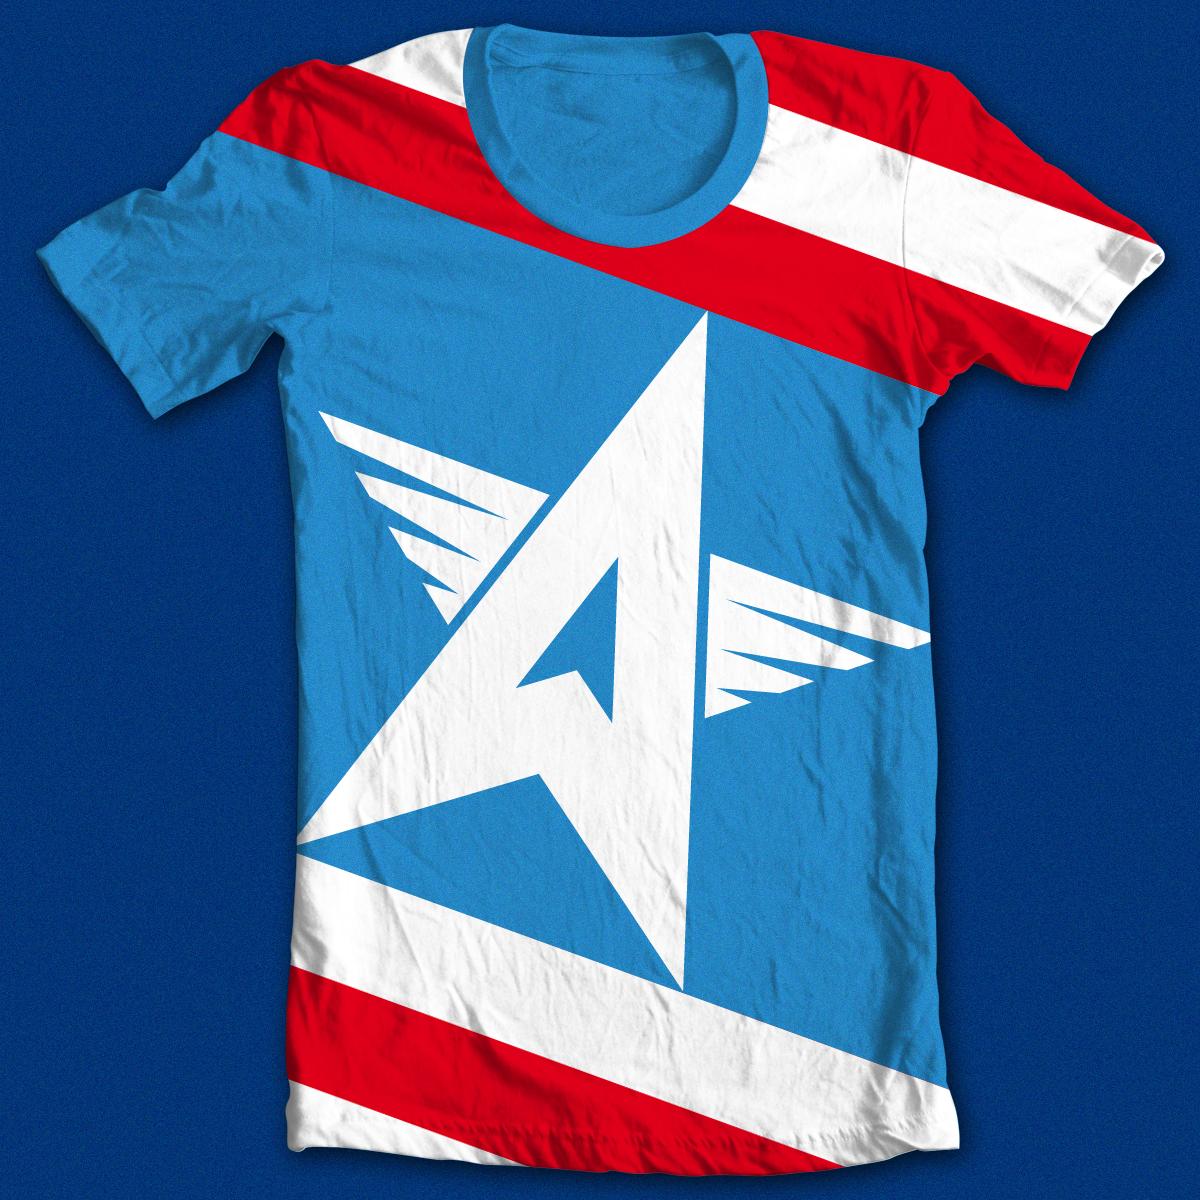 MinimAmerica#3 by kreadid on Threadless